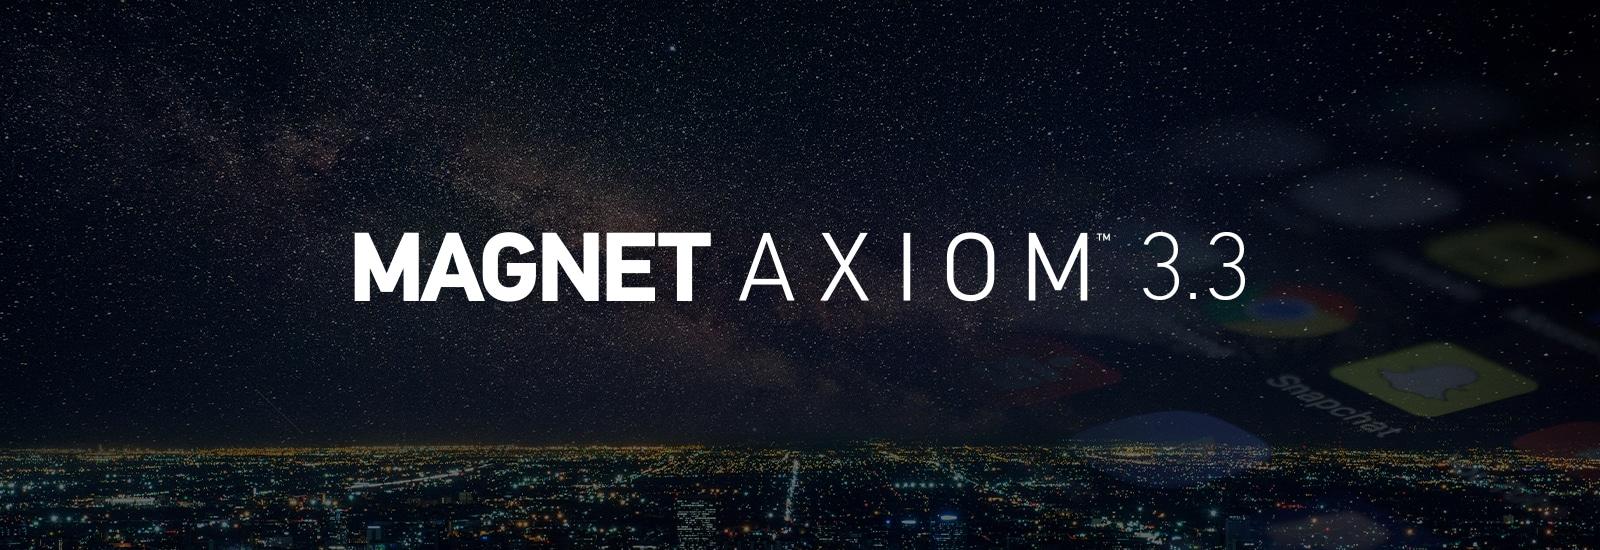 Magnet AXIOM 3.3